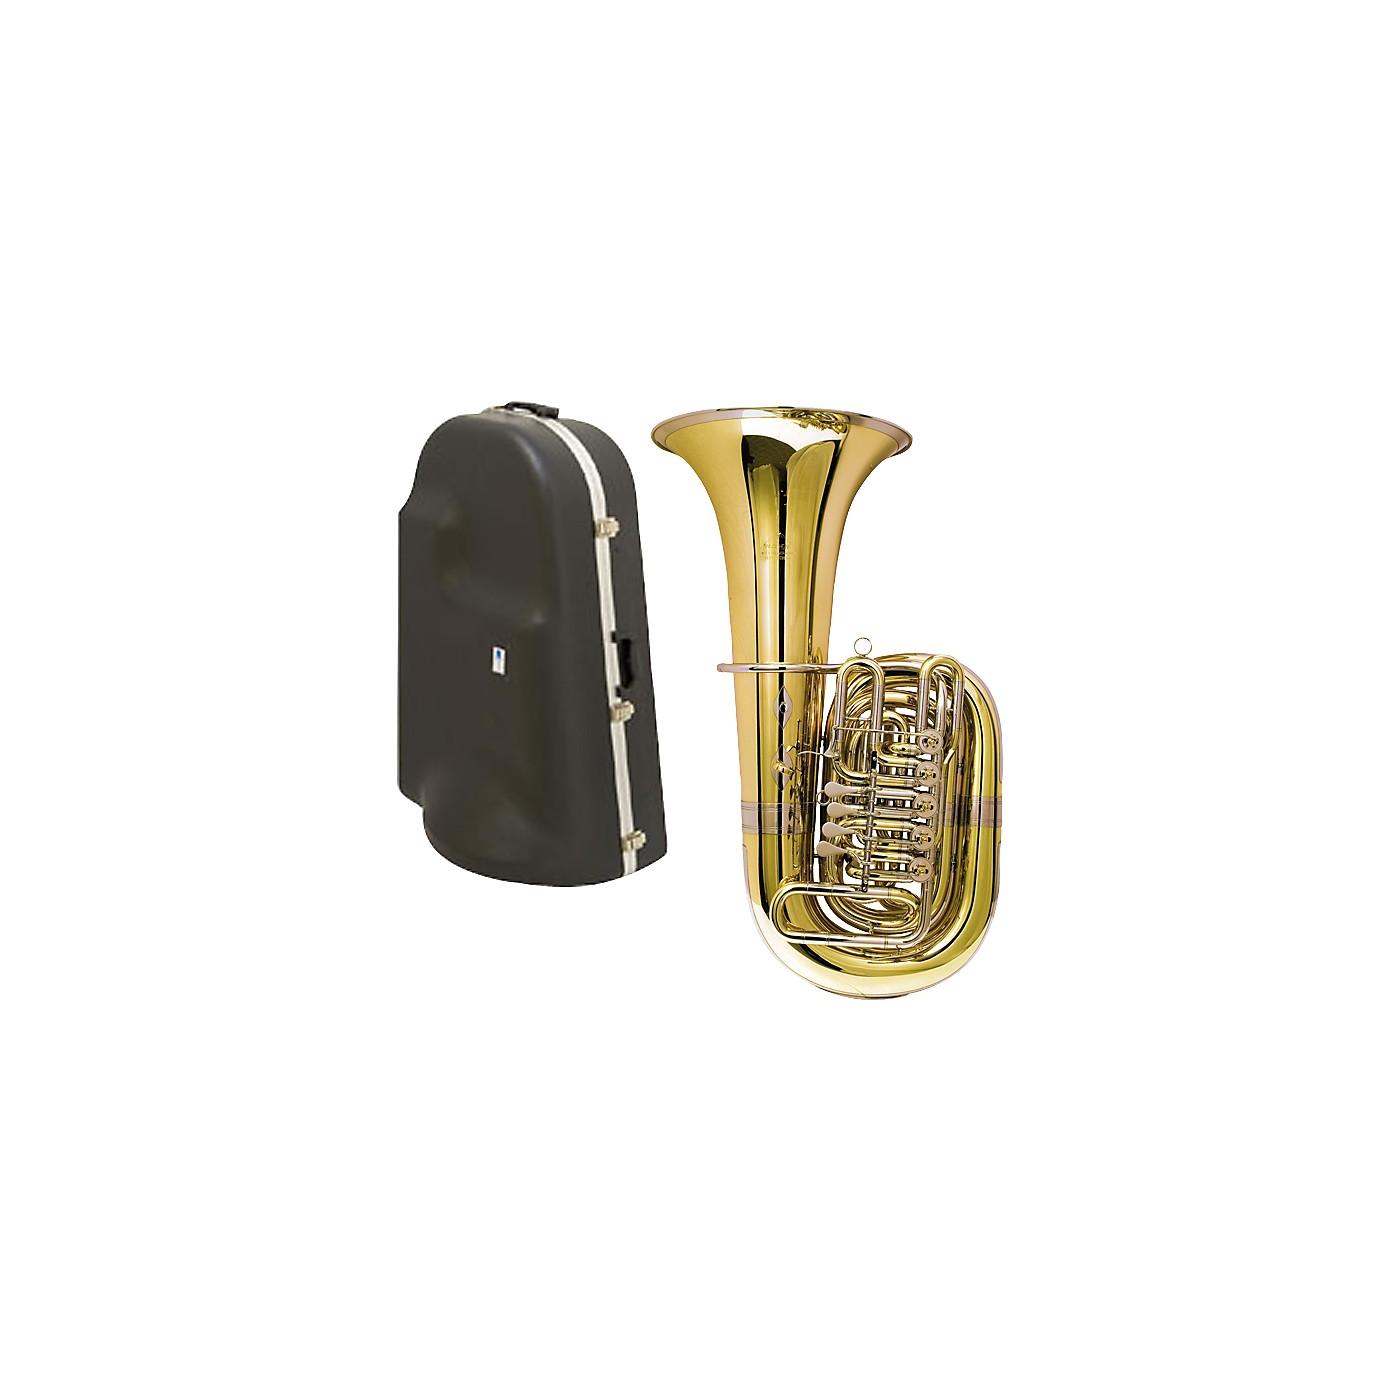 Miraphone 188-5U Series 5-Valve CC Tuba with Hard Case thumbnail